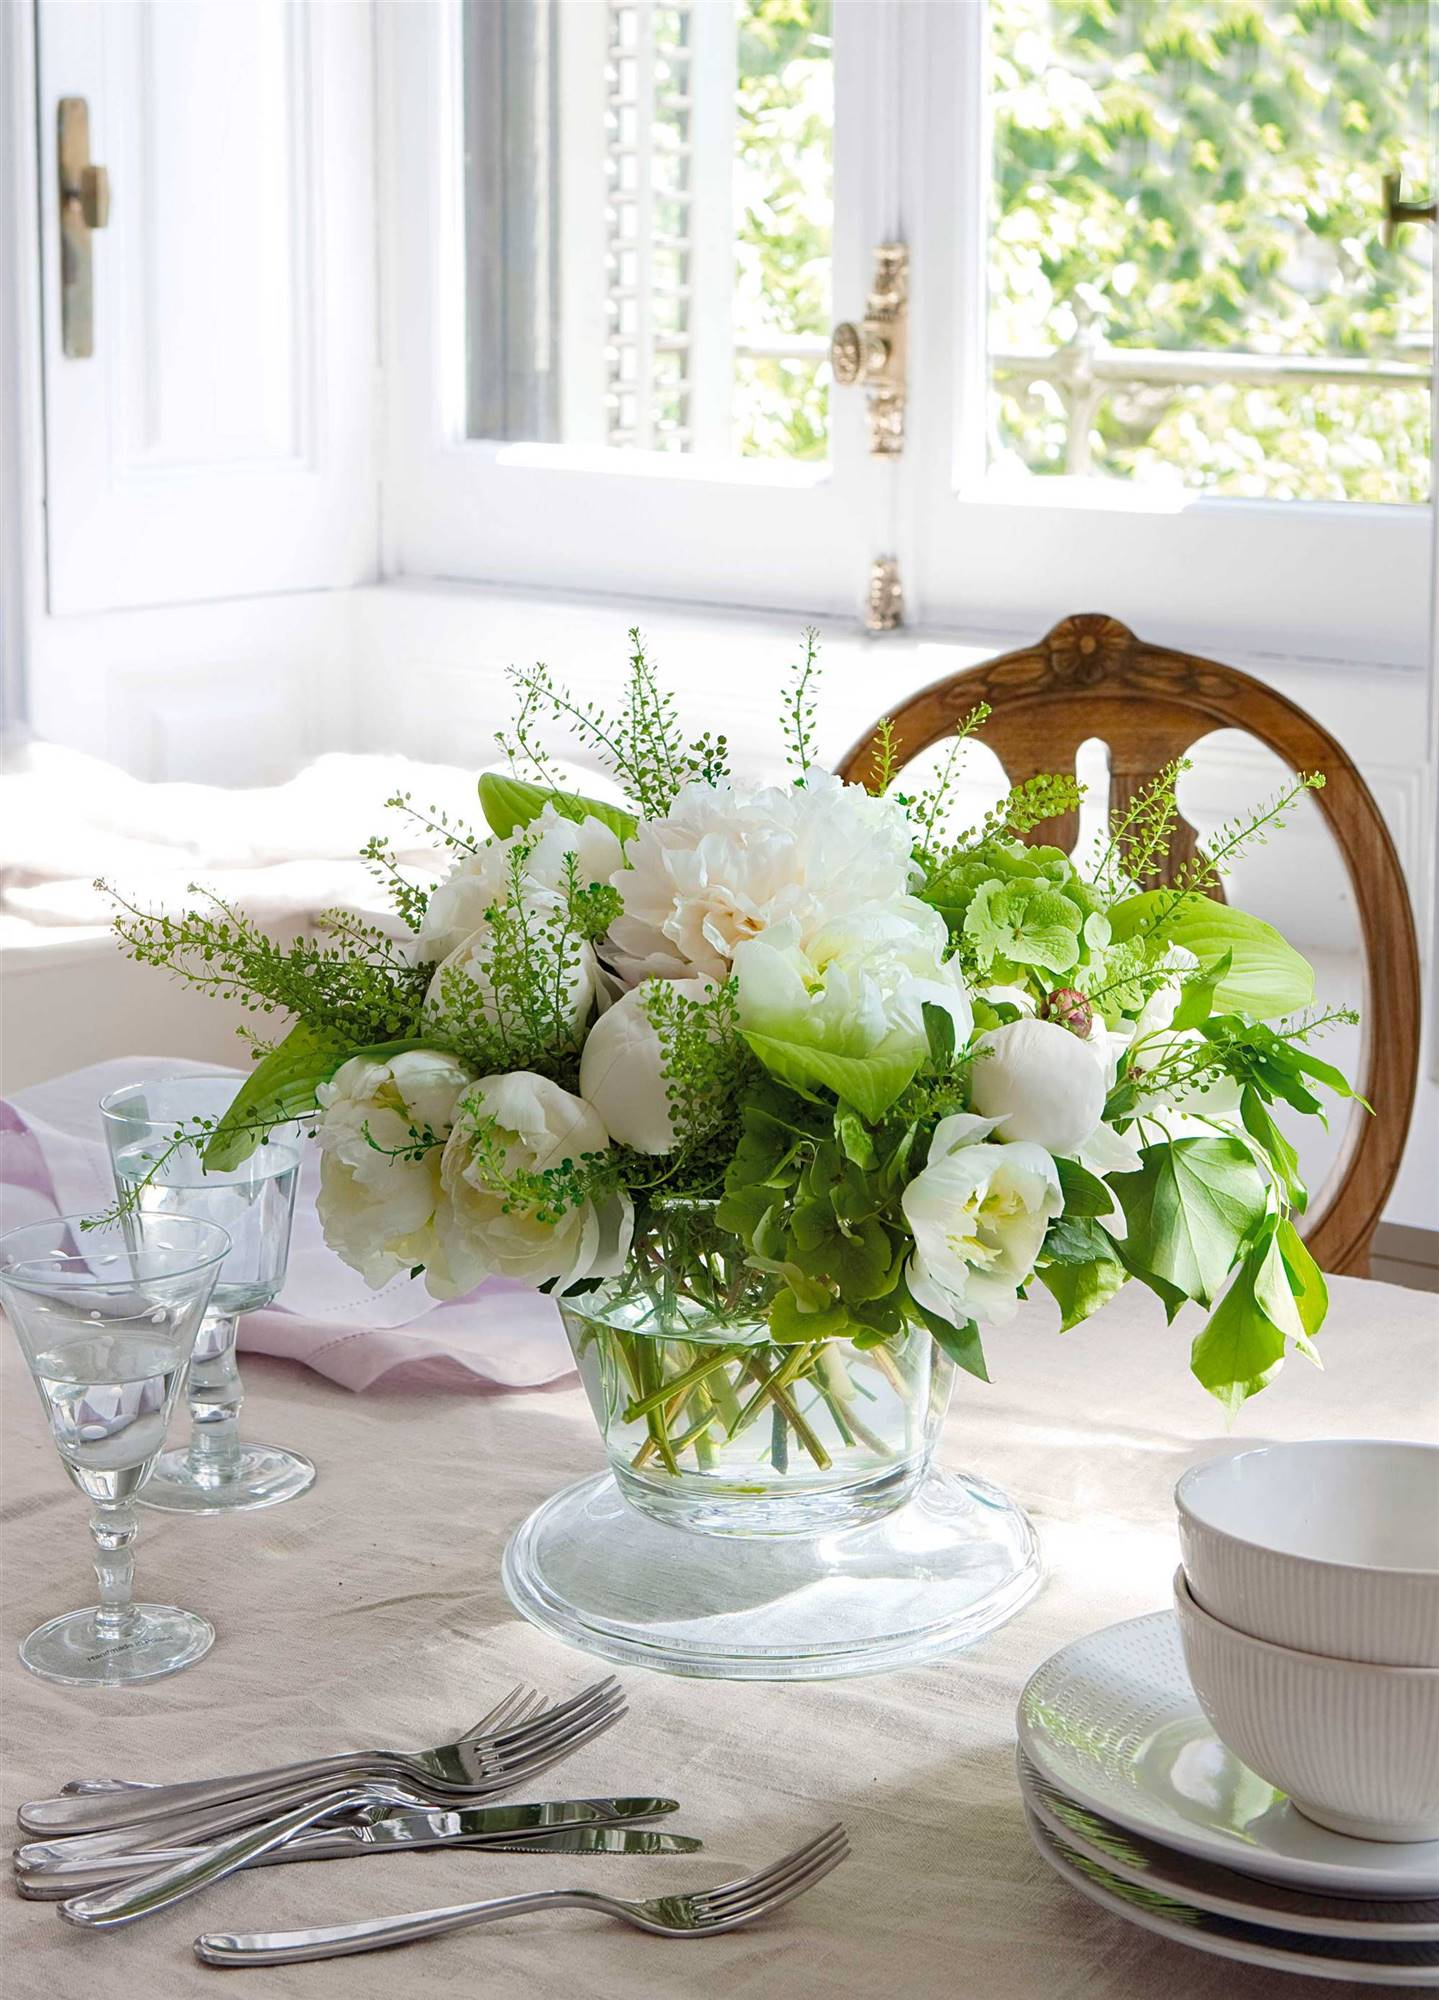 00304552. Un elegante centro de peonias白色花艺